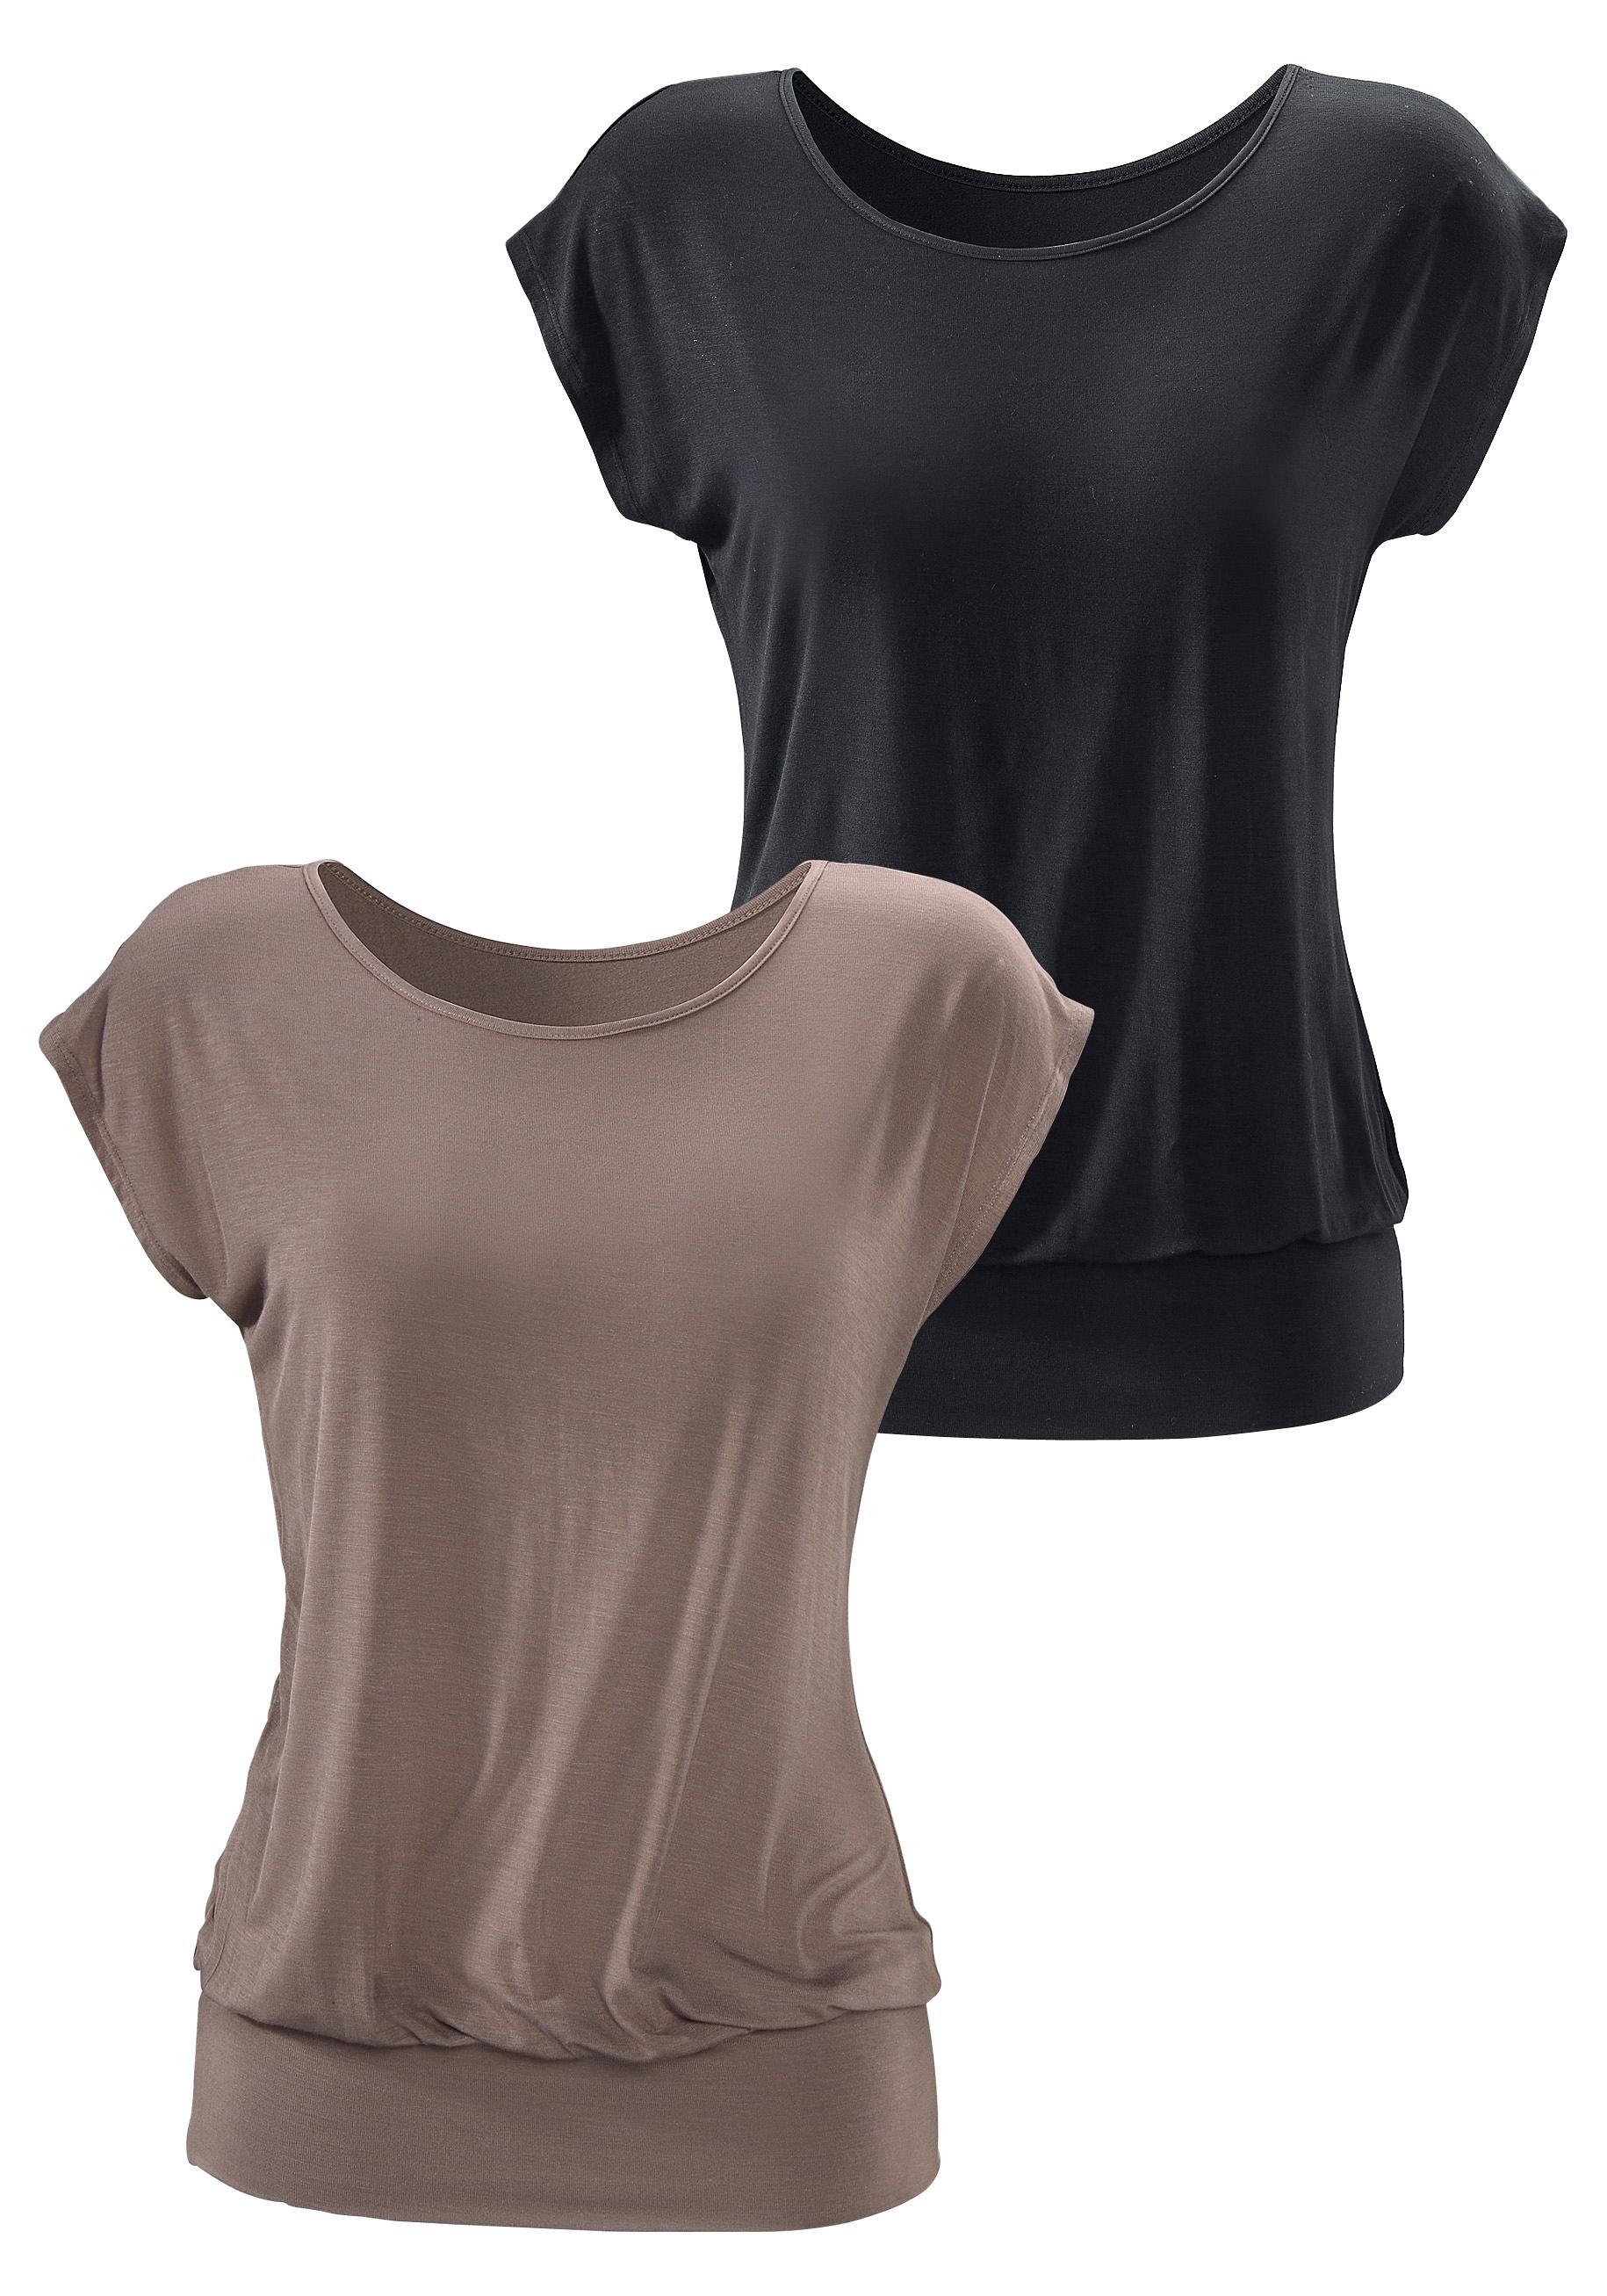 LASCANA lang shirt (set van 2) met brede boord goedkoop op lascana.nl kopen